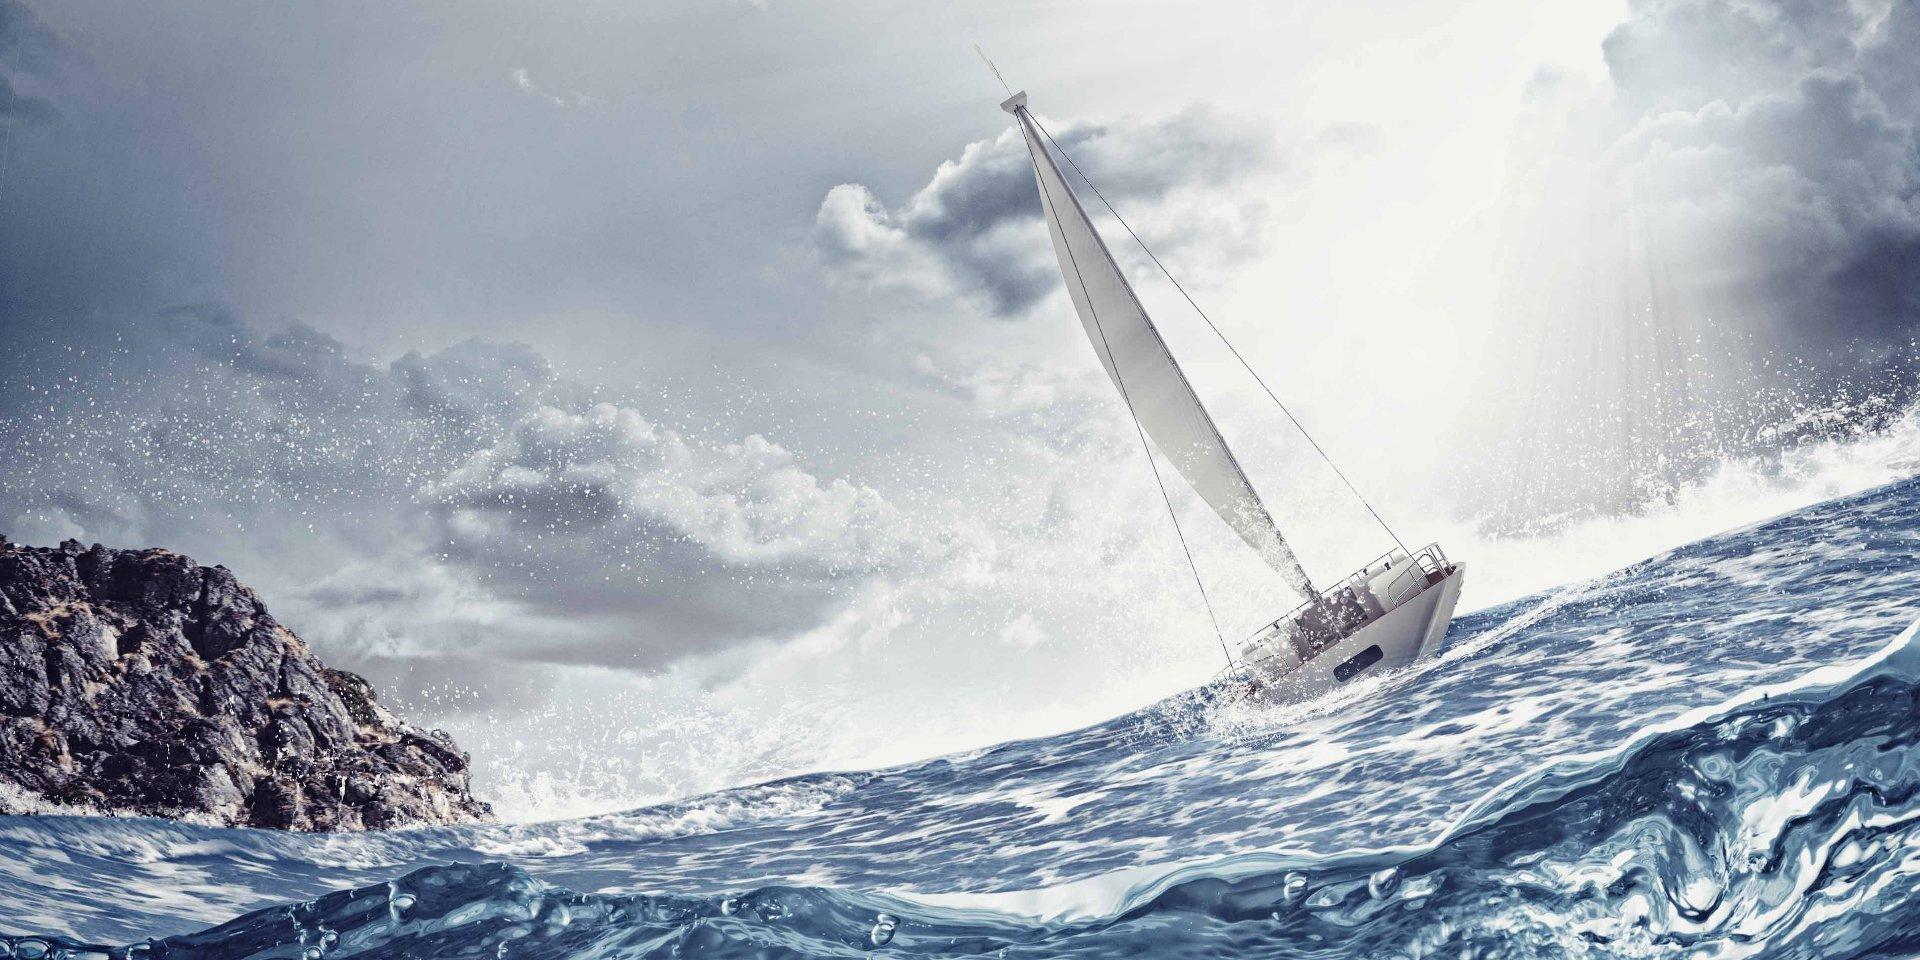 Boat_sunny_large.jpg